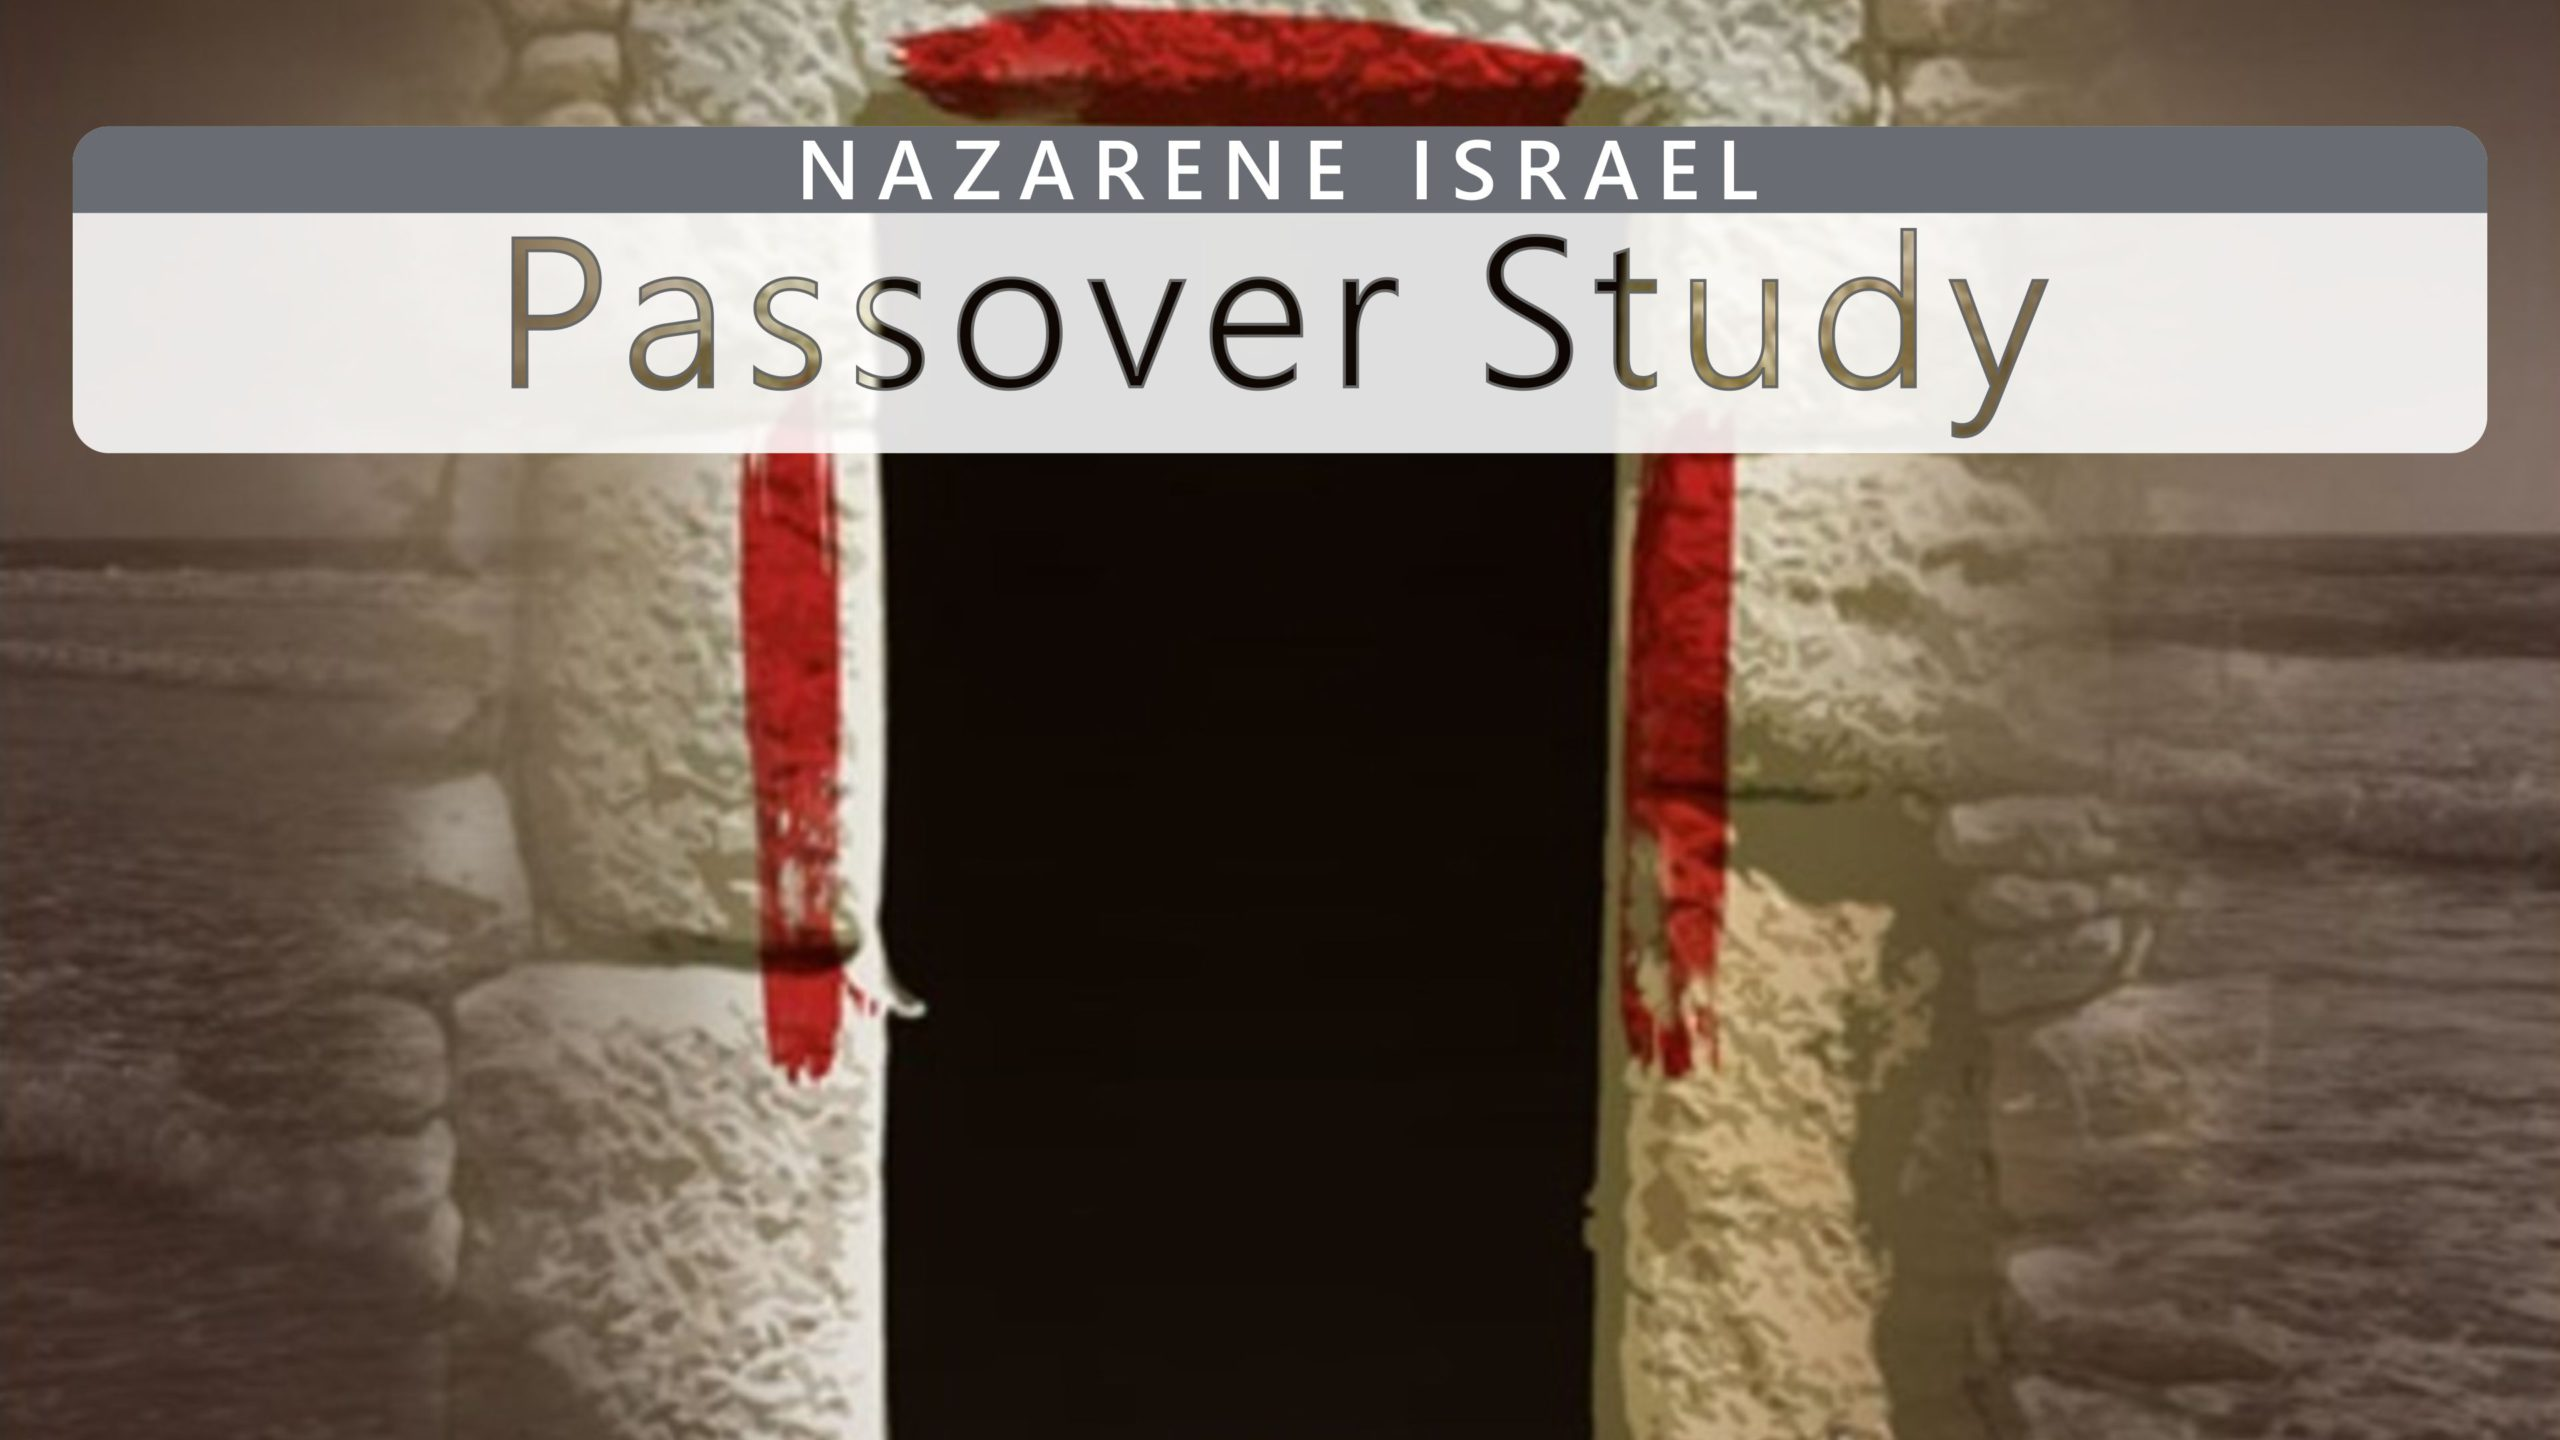 Nazarene Israel Passover Study